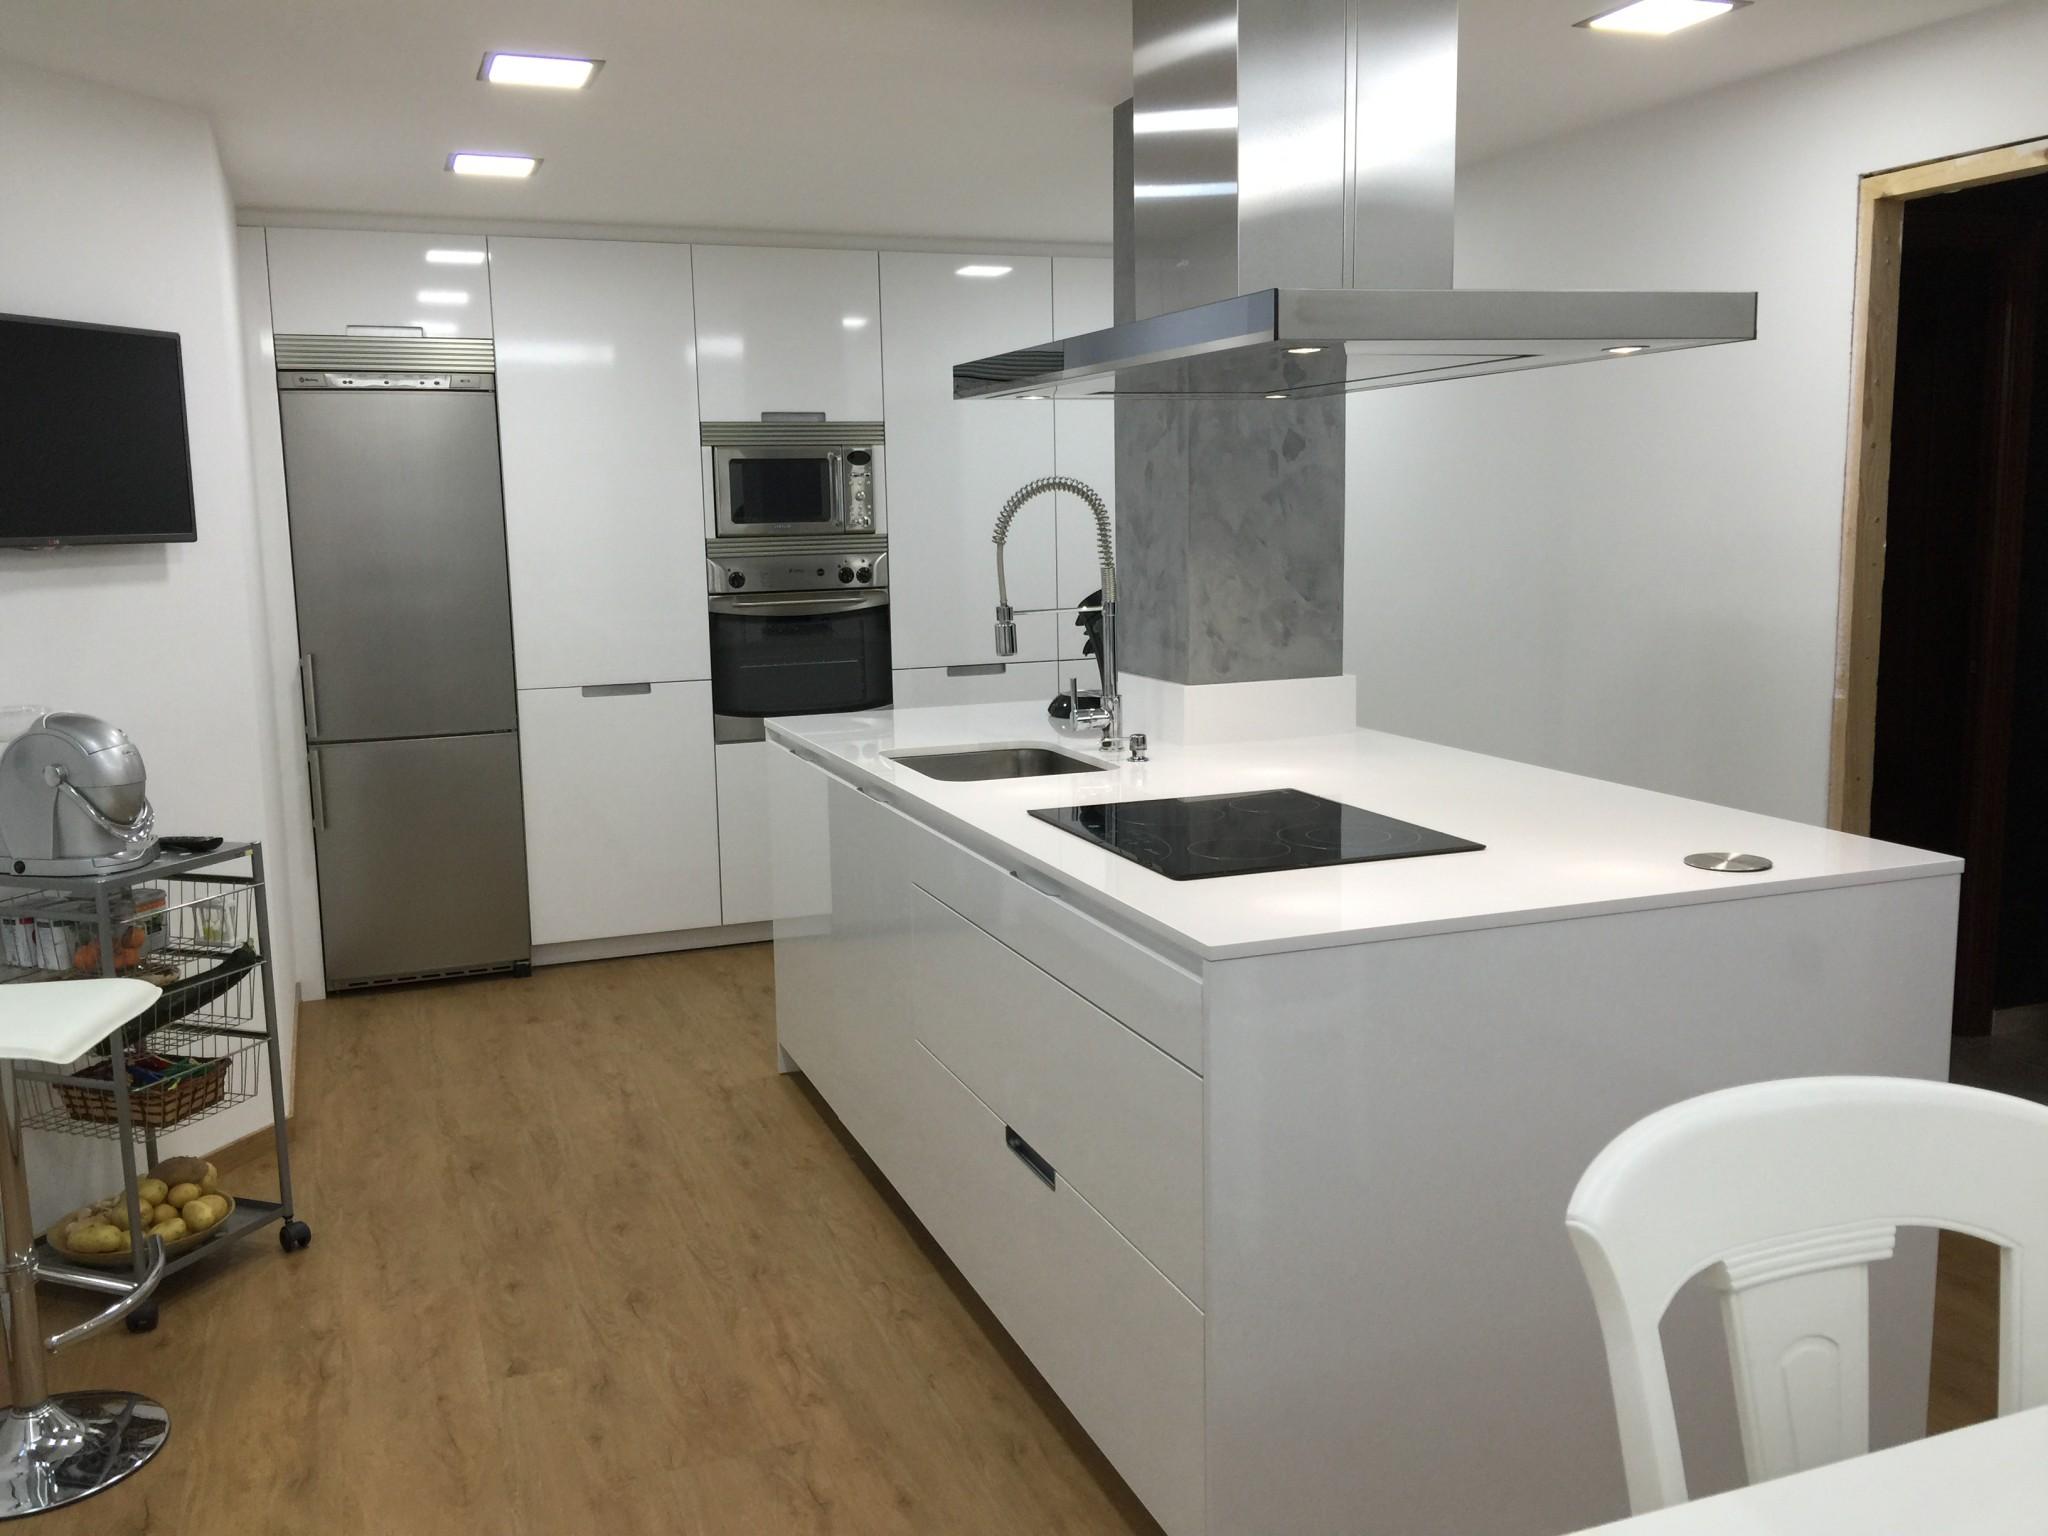 Cocina con columna integrada en la isla lumber cocinas for Cocinas en l modernas